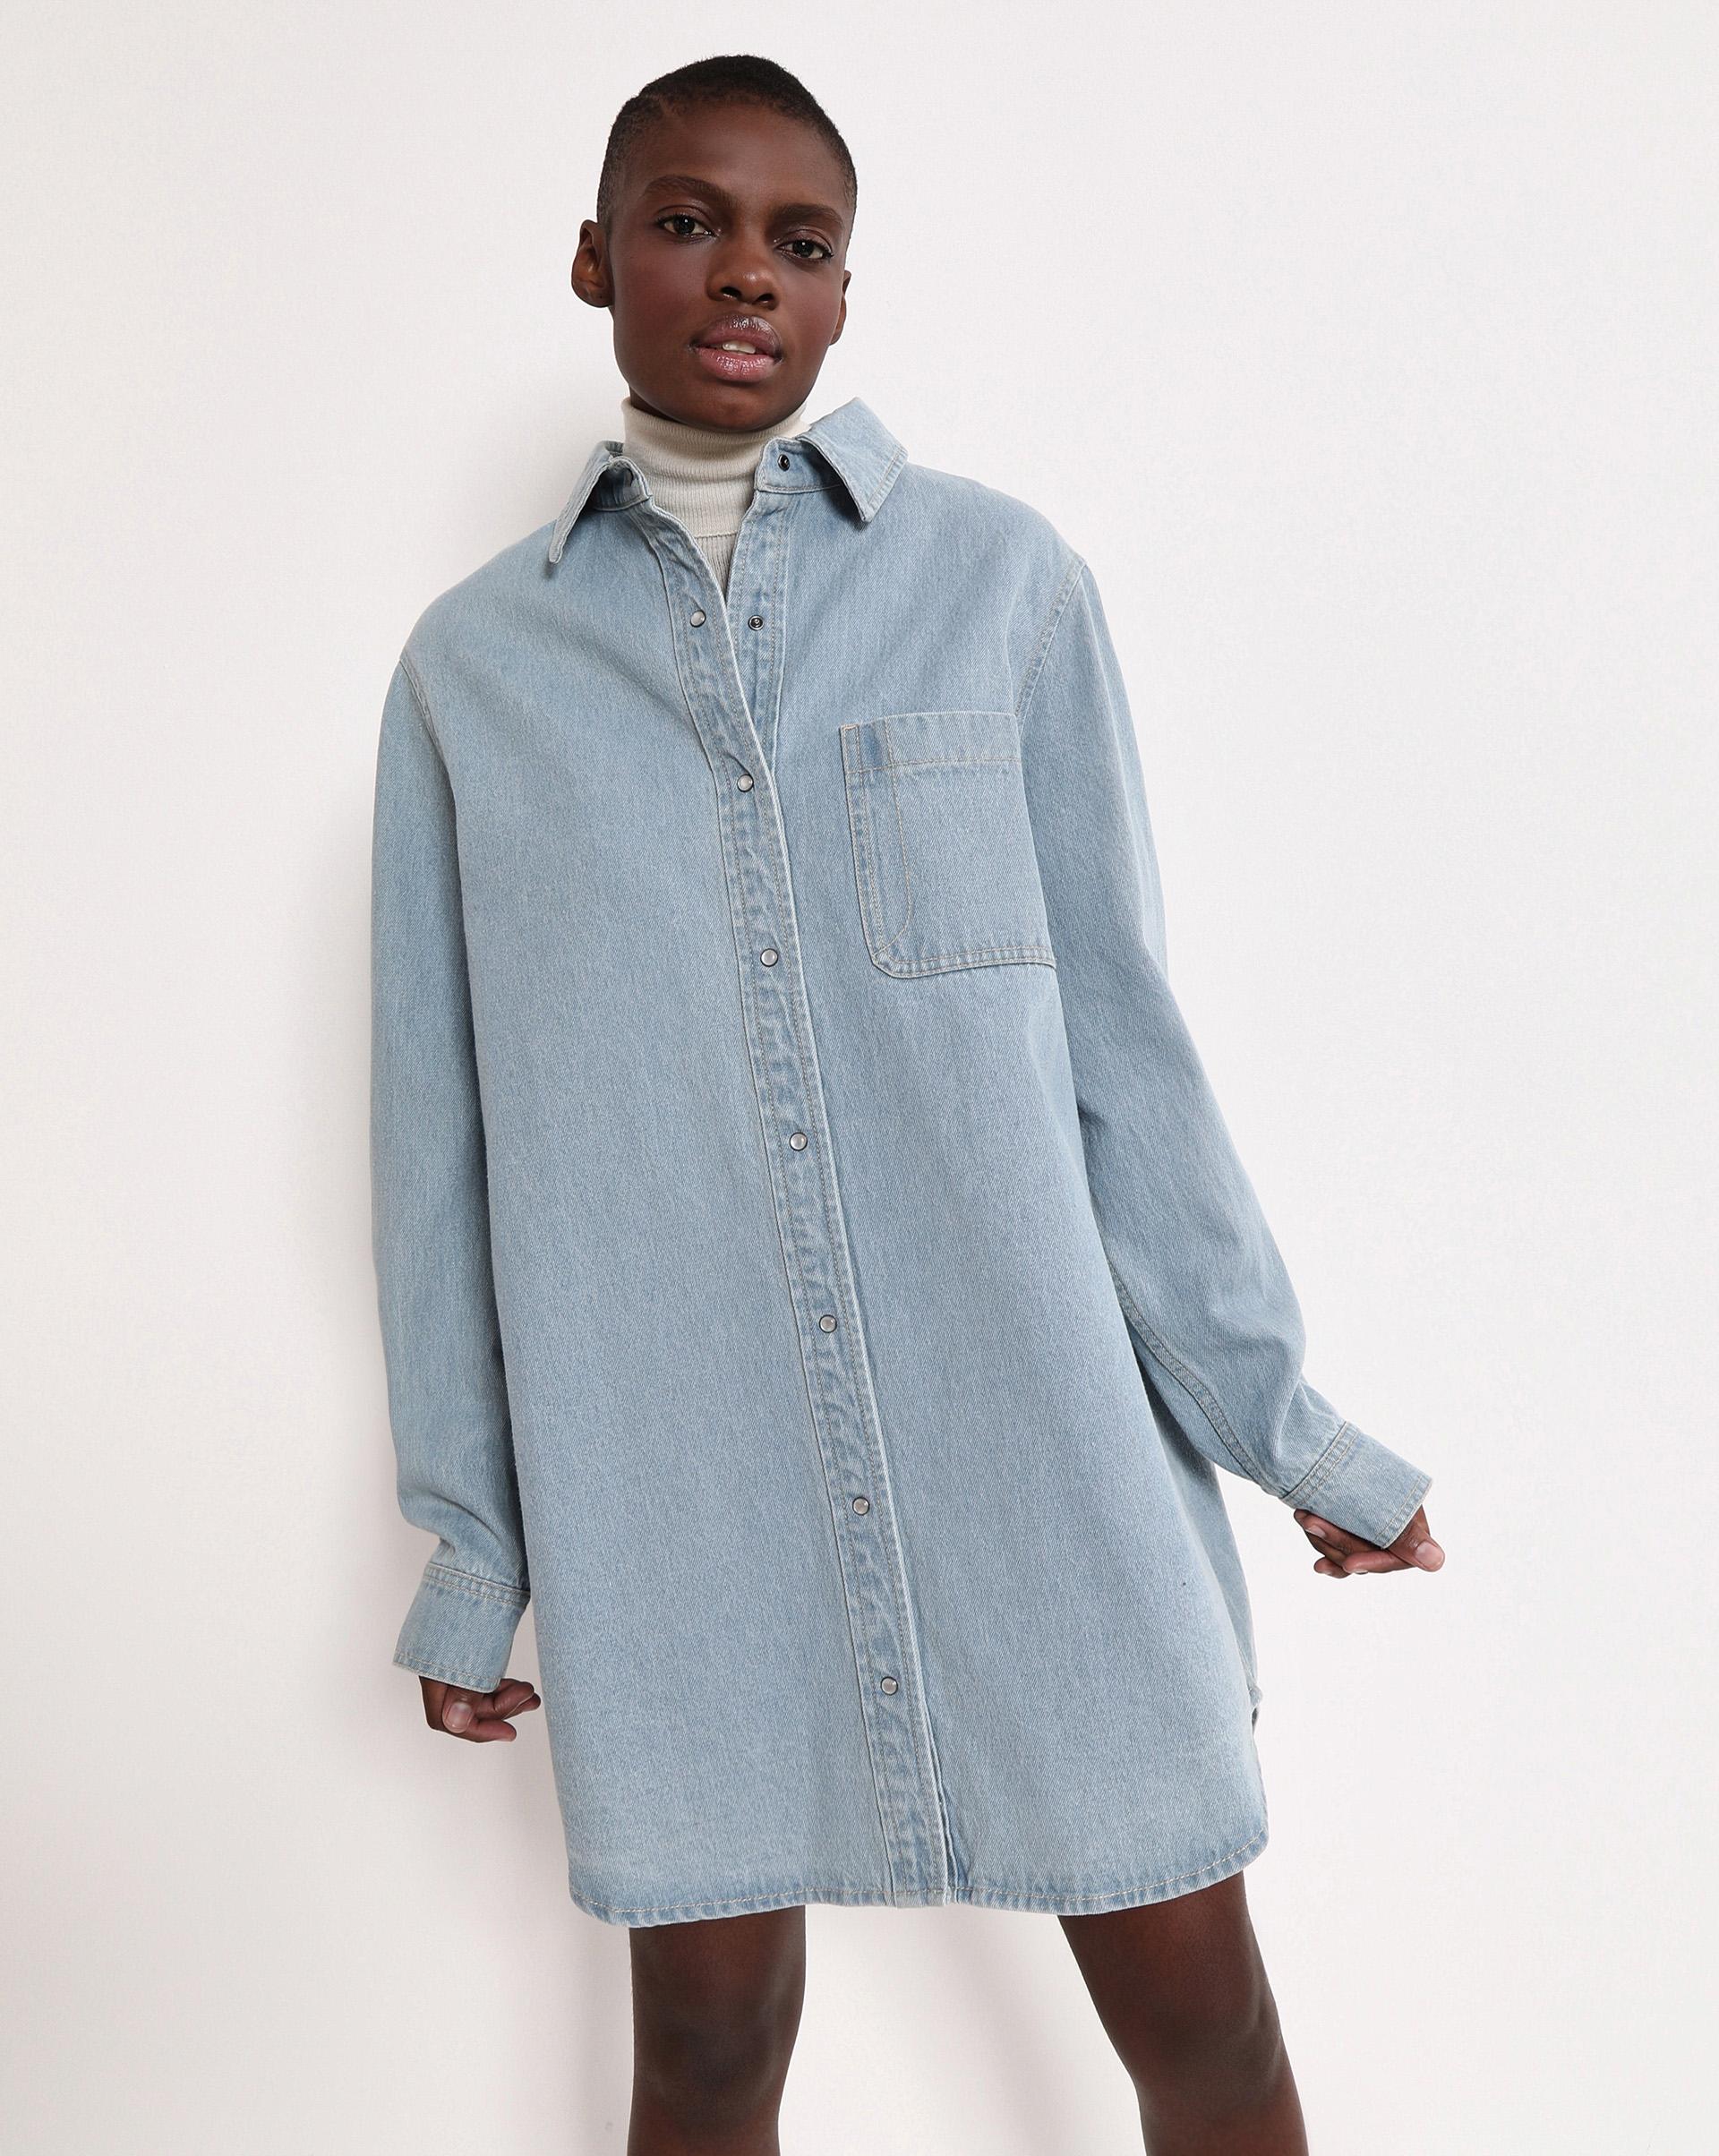 12STOREEZ Джинсовое платье-рубашка